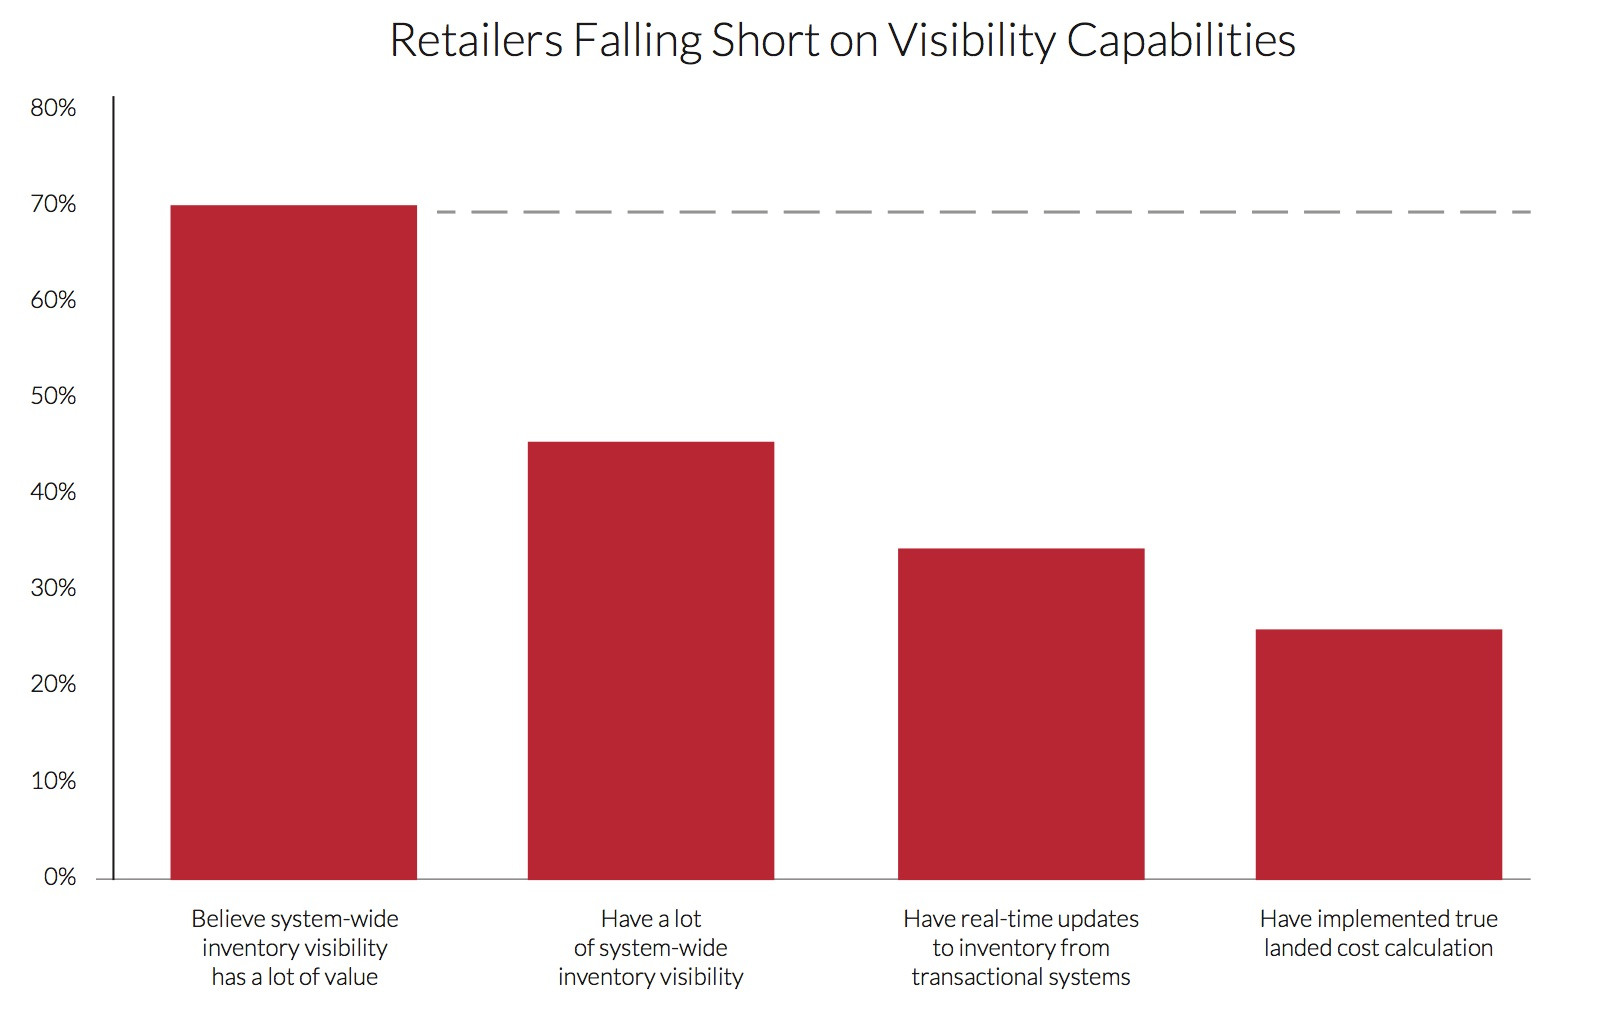 RetailersFallShortSCVisibility